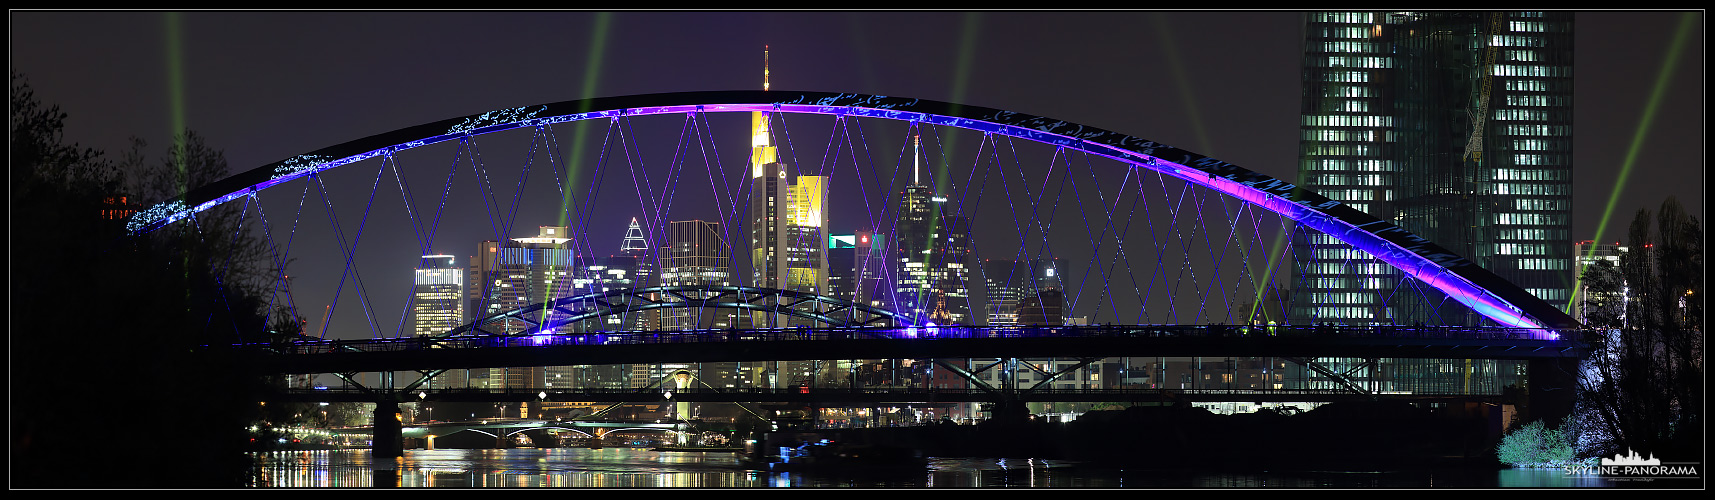 Frankfurt Luminale 2014